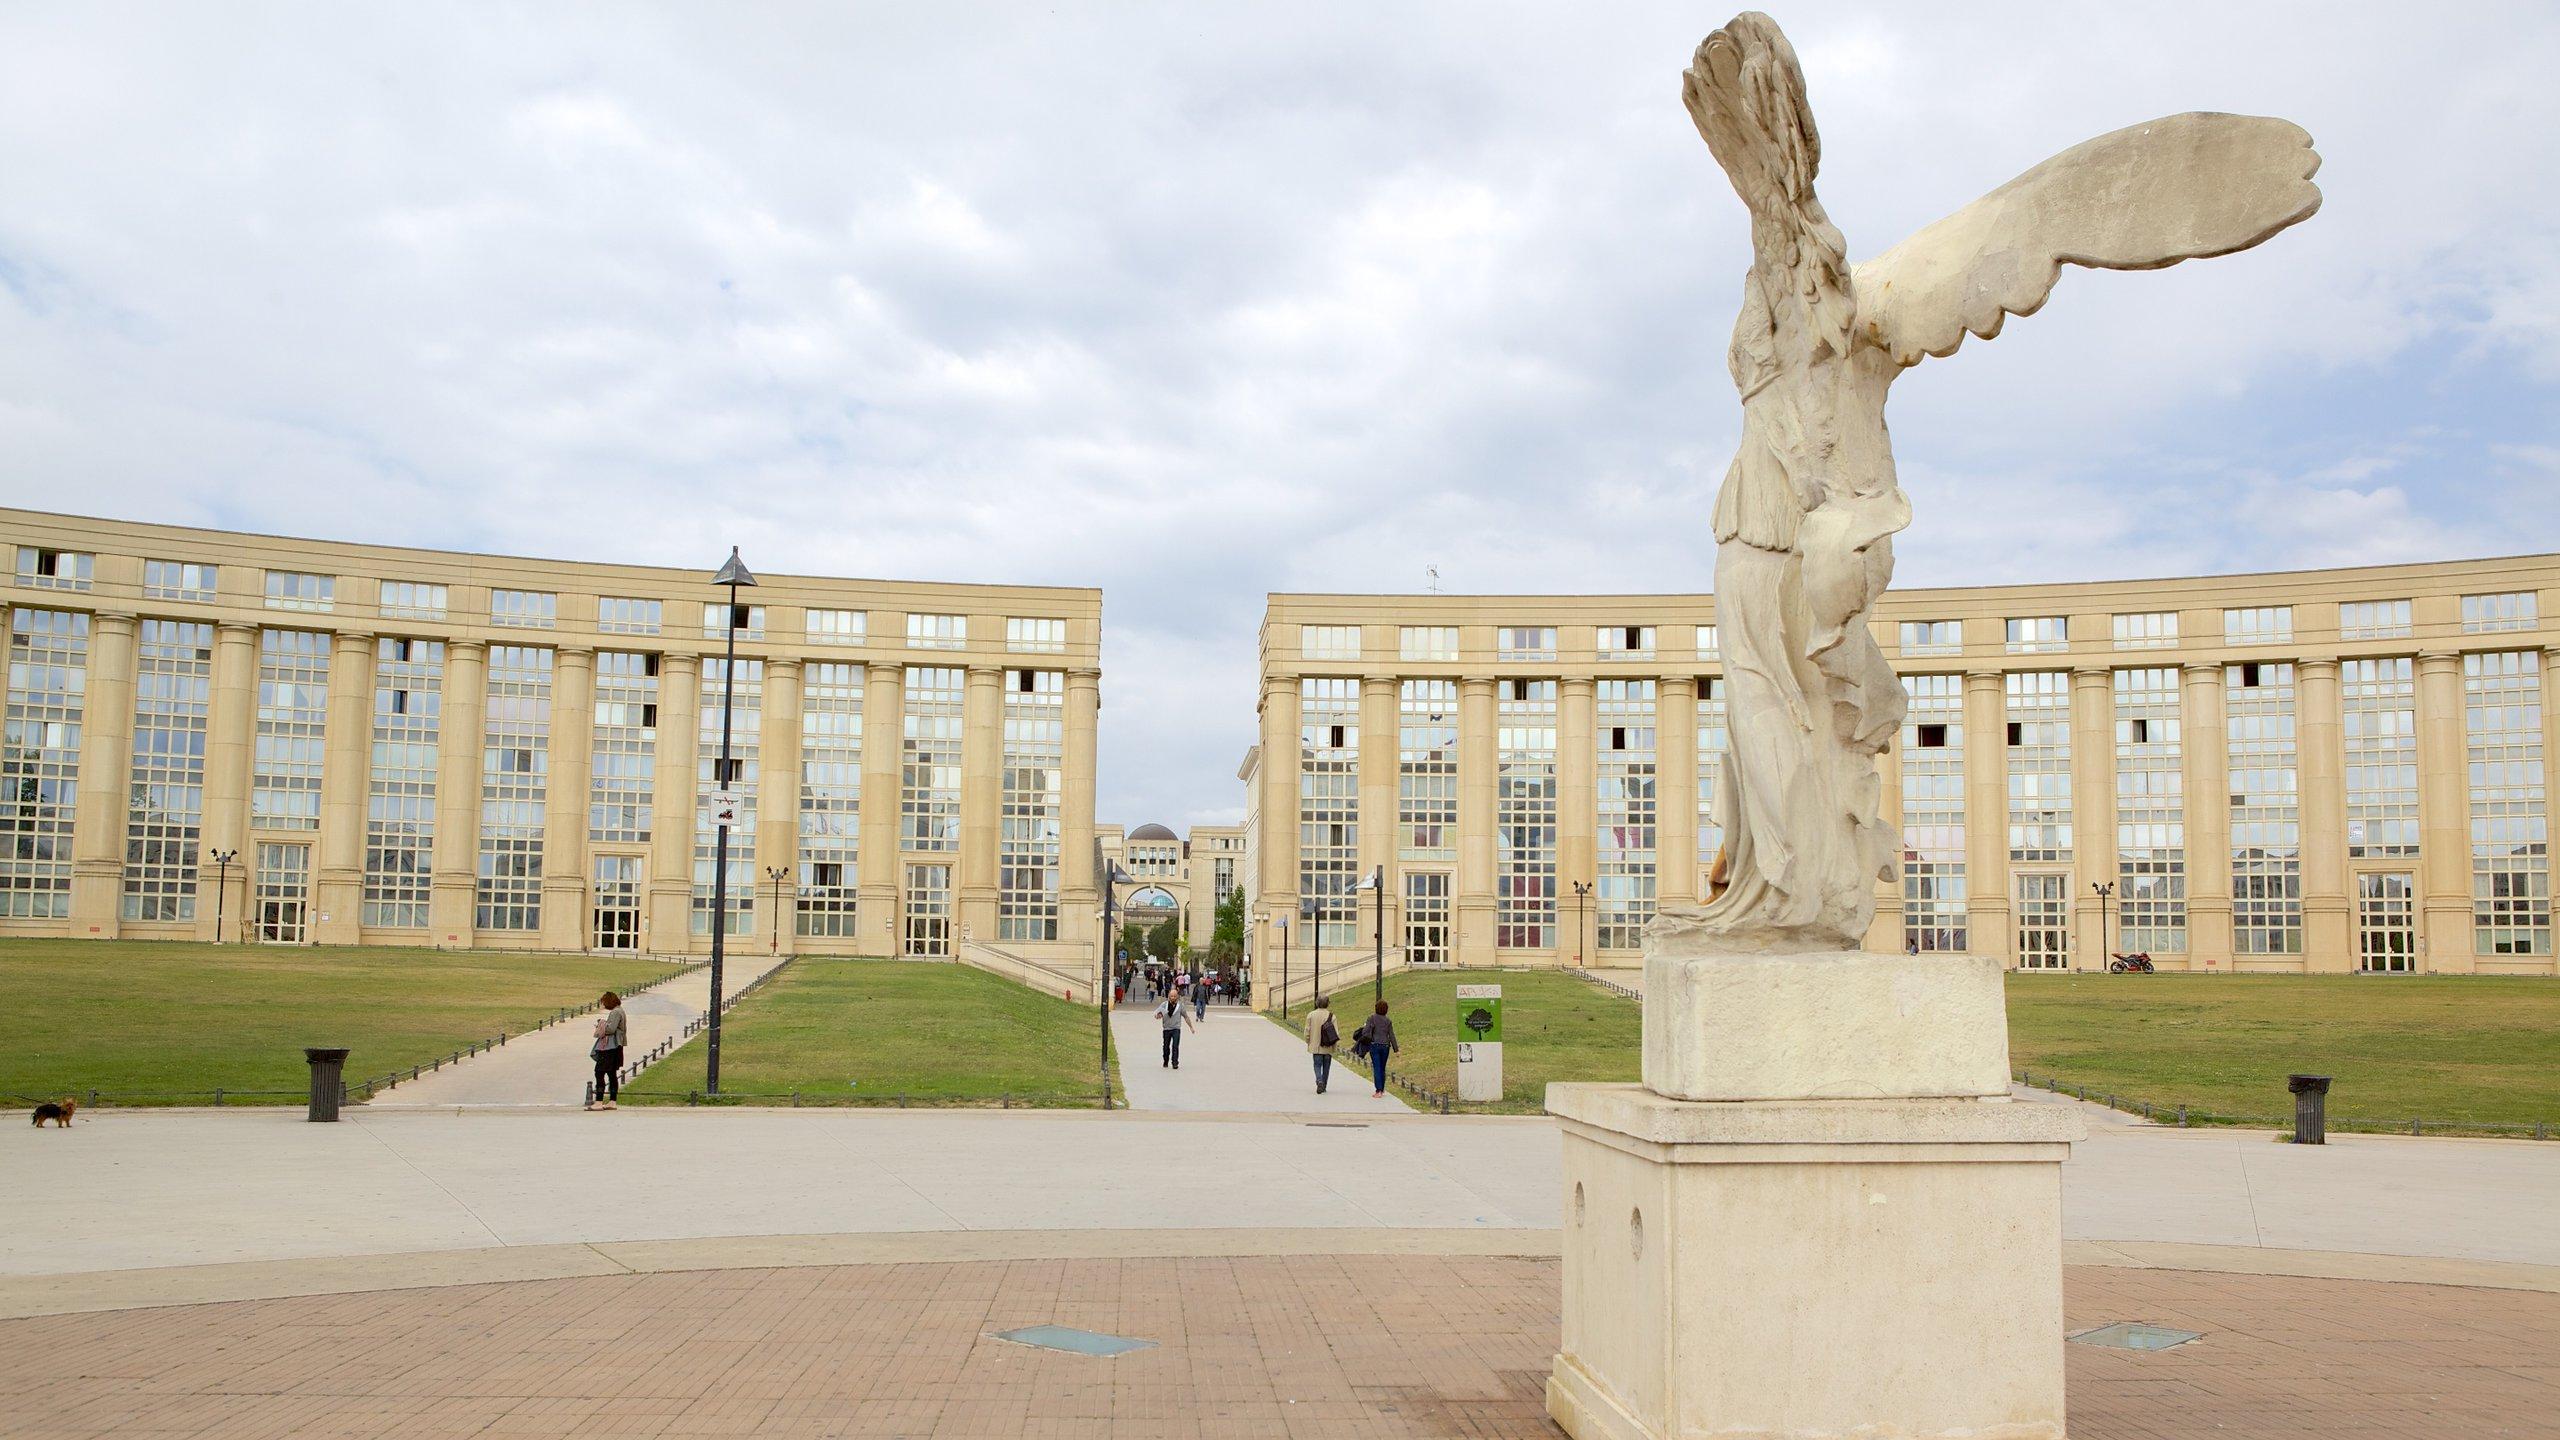 Antigone, Montpellier, Hérault (departement), Frankrijk